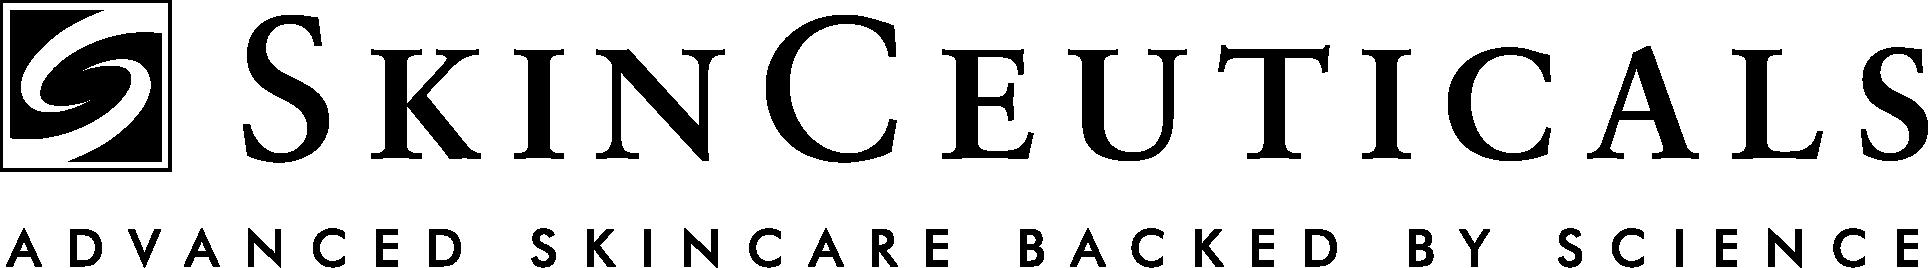 Filesskinceuticals-logo-no-background.png